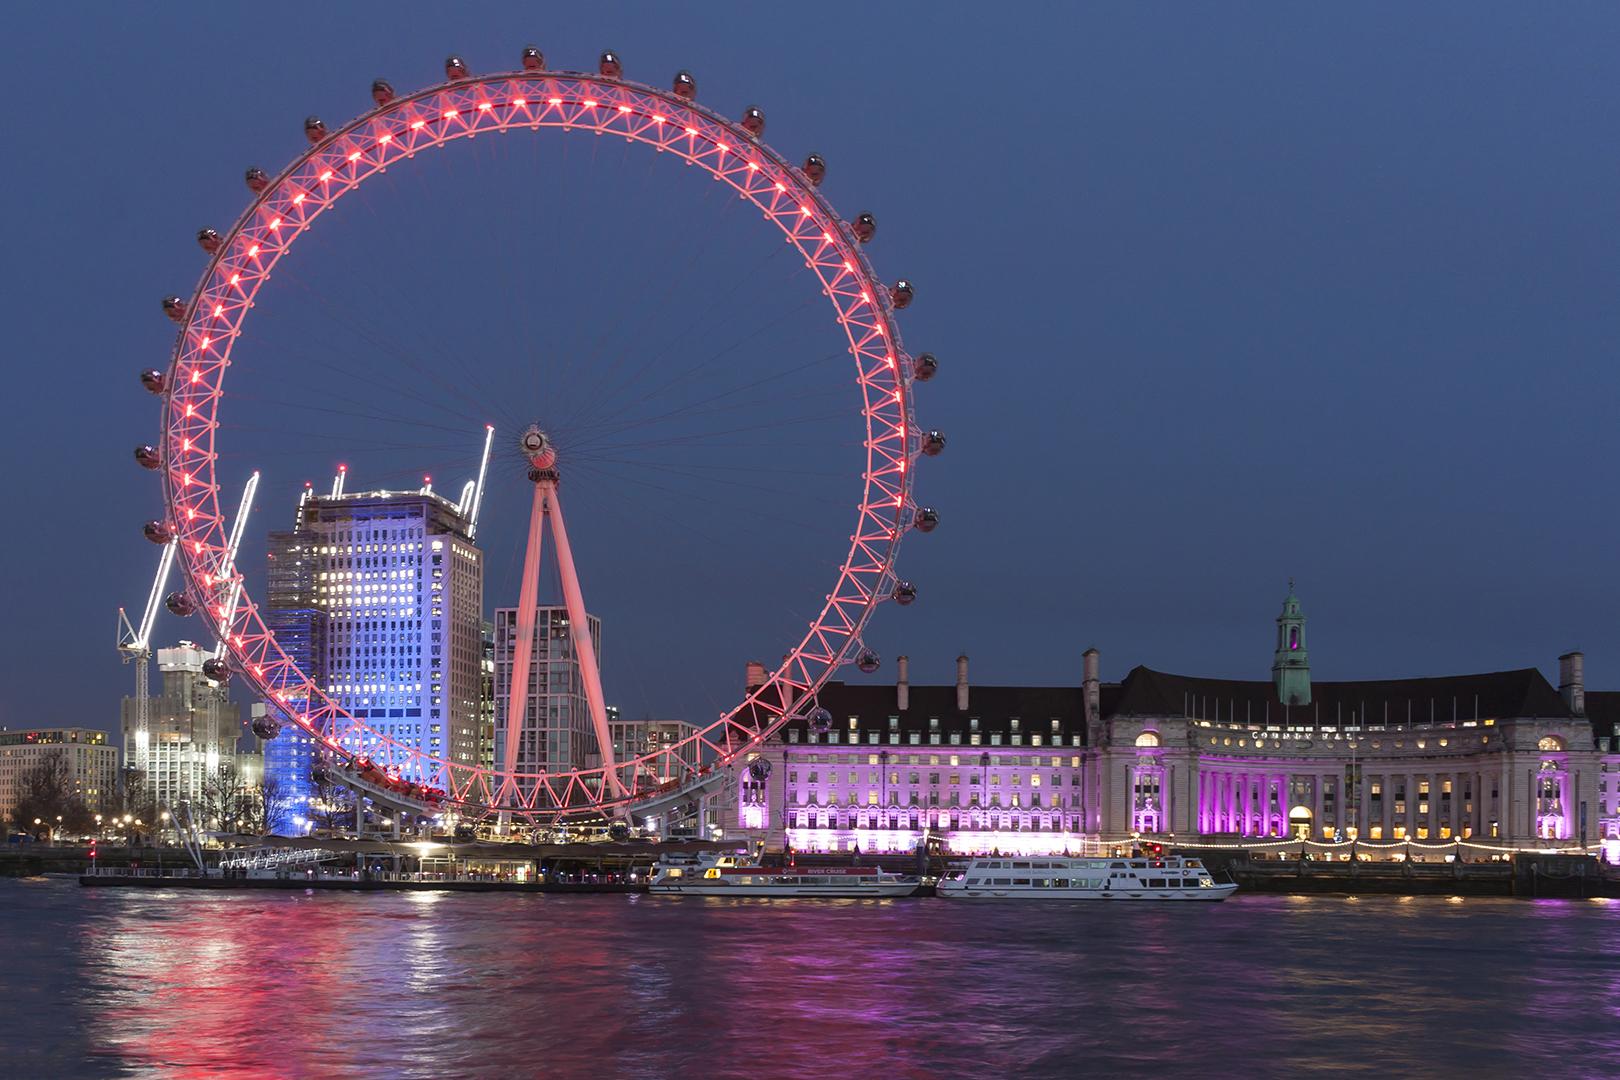 london eye reflections.jpg